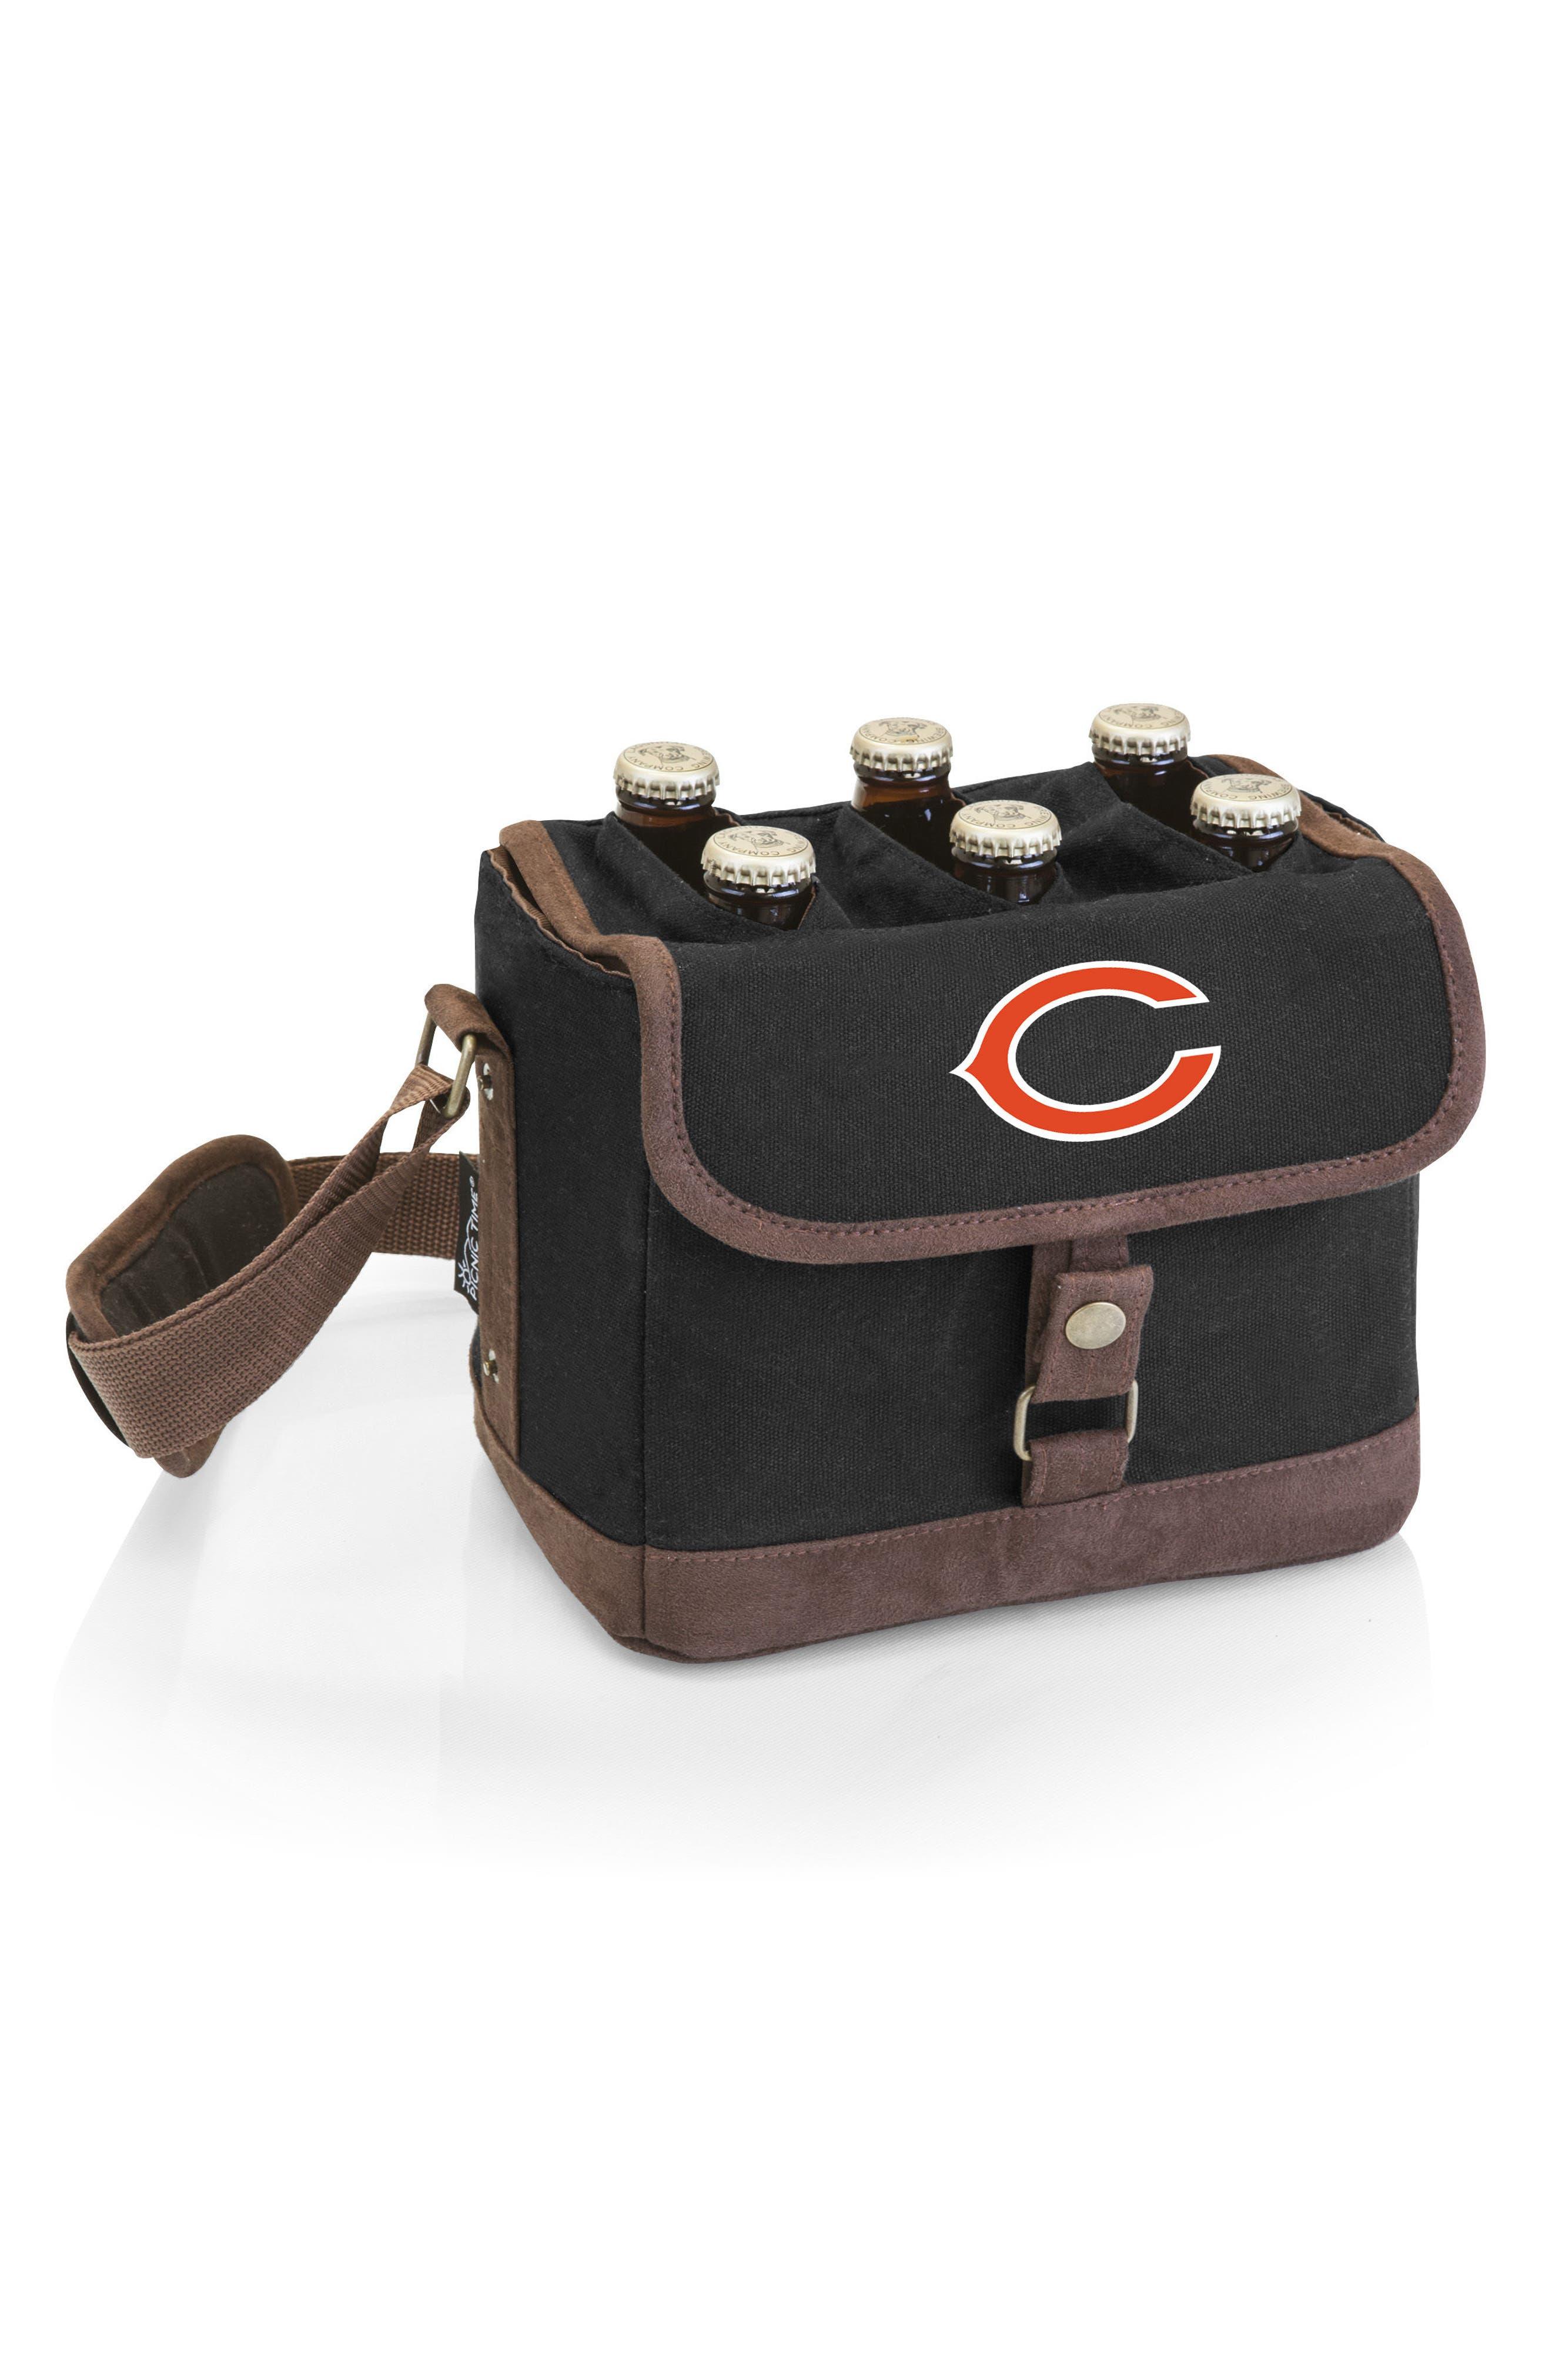 Main Image - Picnic Time NFL Team Logo Beer Caddy Cooler Tote